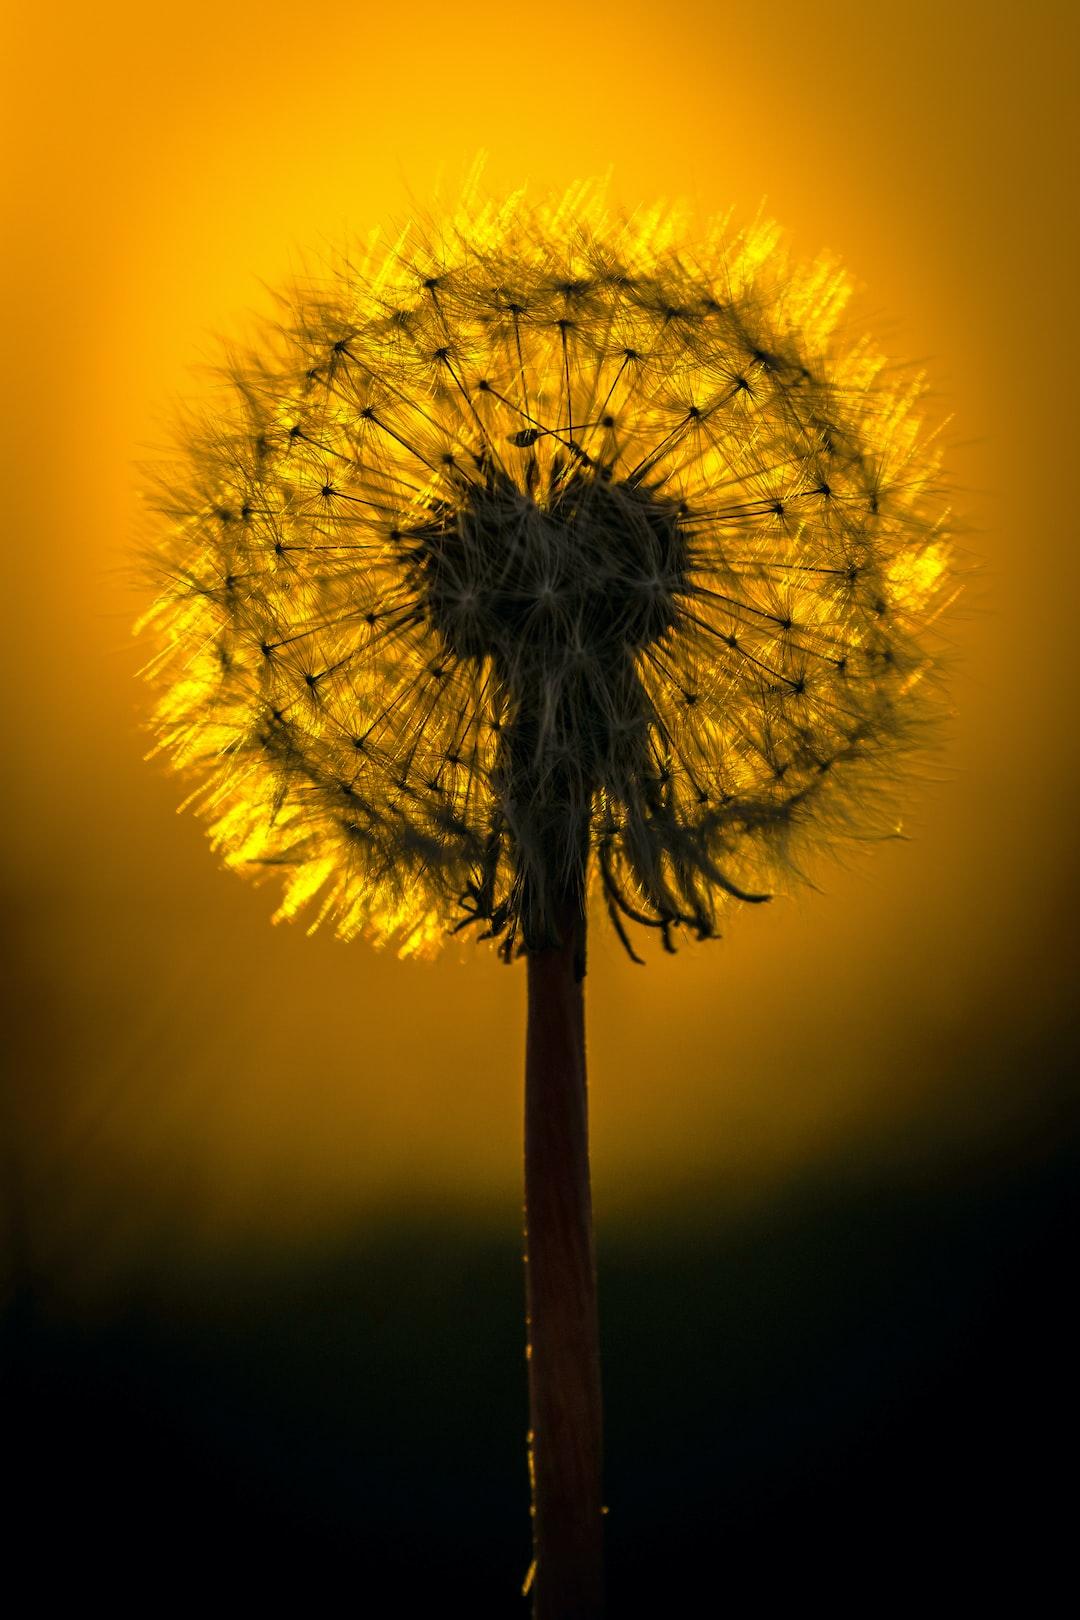 Dandelion seed head backlit by the Sun at golden hour in Edinburgh, Scotland.